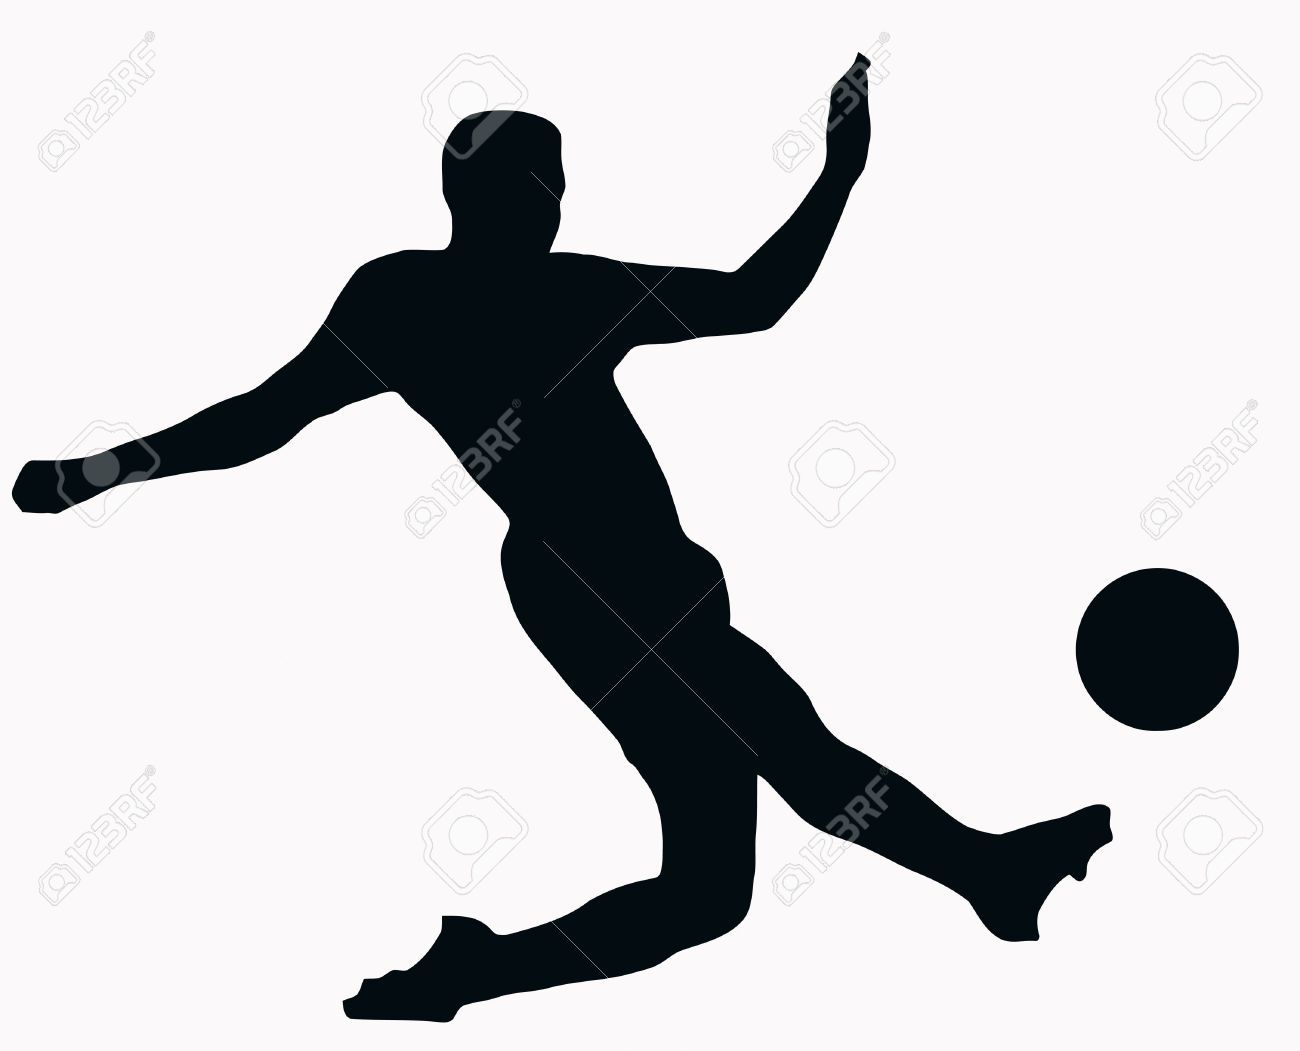 Fondos De Pantalla Fútbol Pelota Silueta Deporte: Clipart Images, Free Clipart